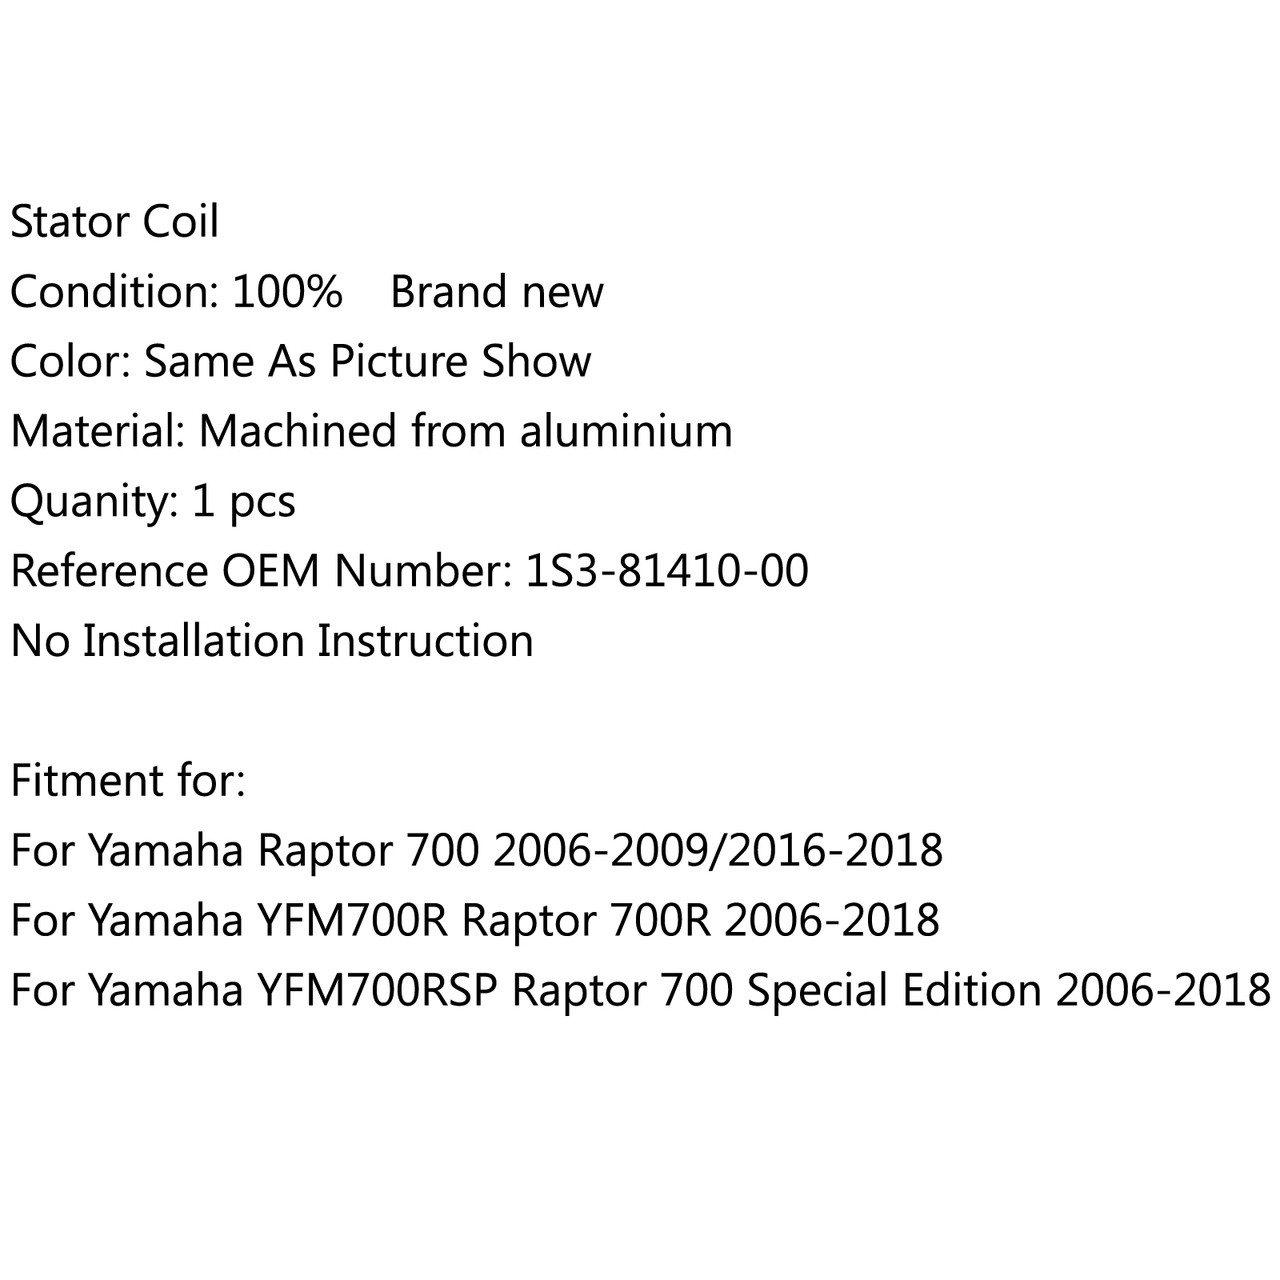 Magneto Generator Stator Coil for Yamaha Raptor 700 Edition YFM700R Special